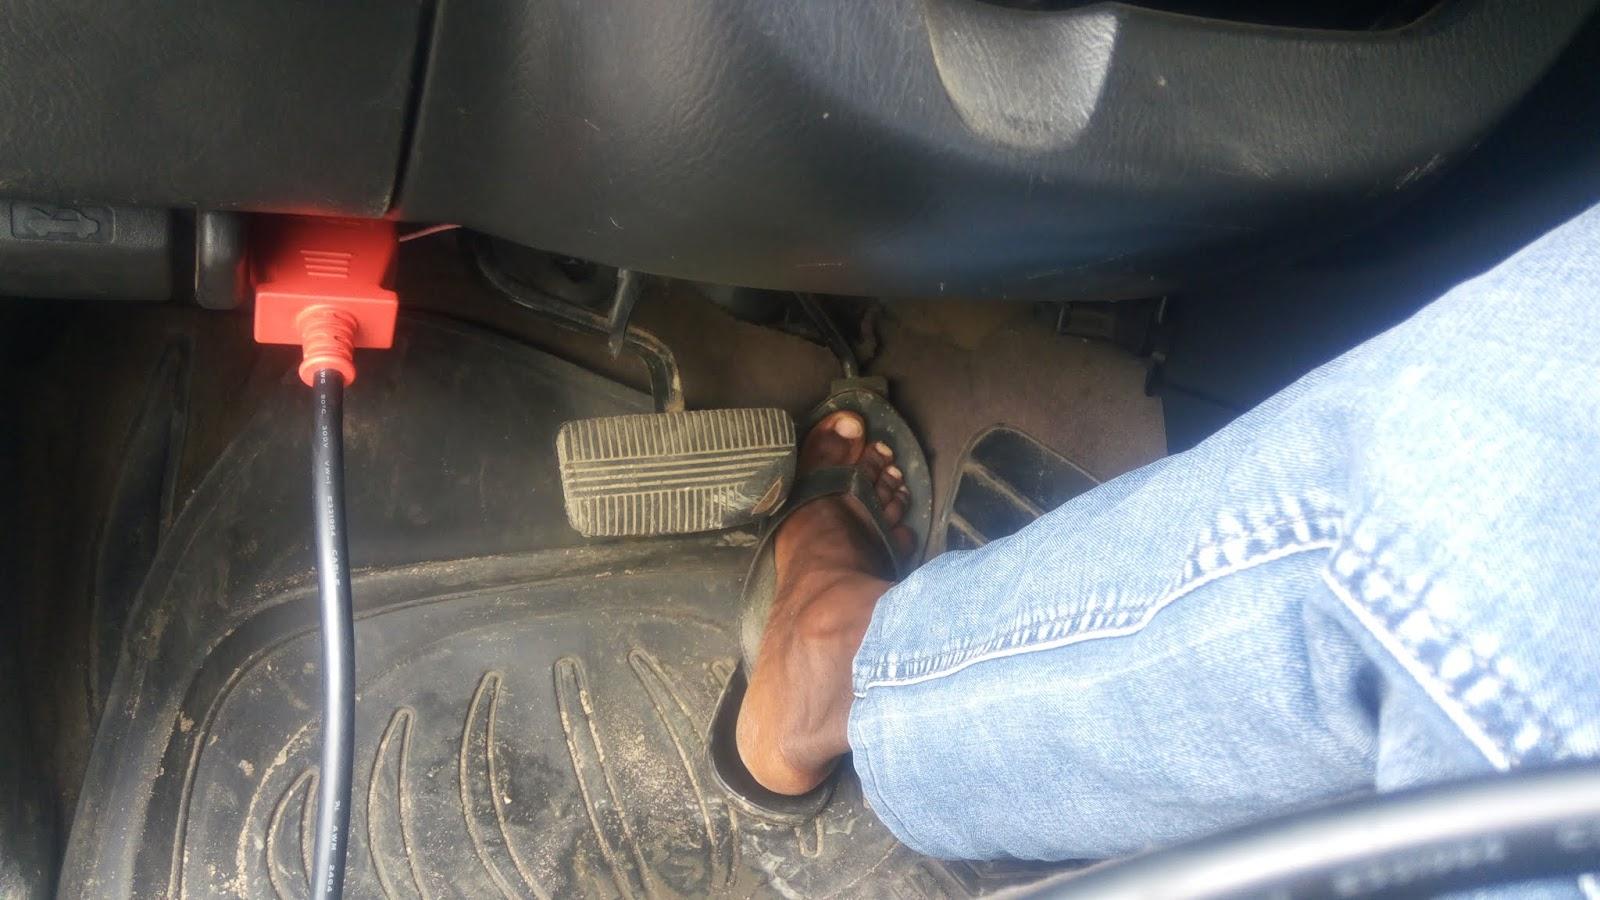 Mechomedics Nissan Pathfinder Air Fuel Ratio Circuit Slow Response Bank 2 Sensor Fully Depressed Accelerator Pedal